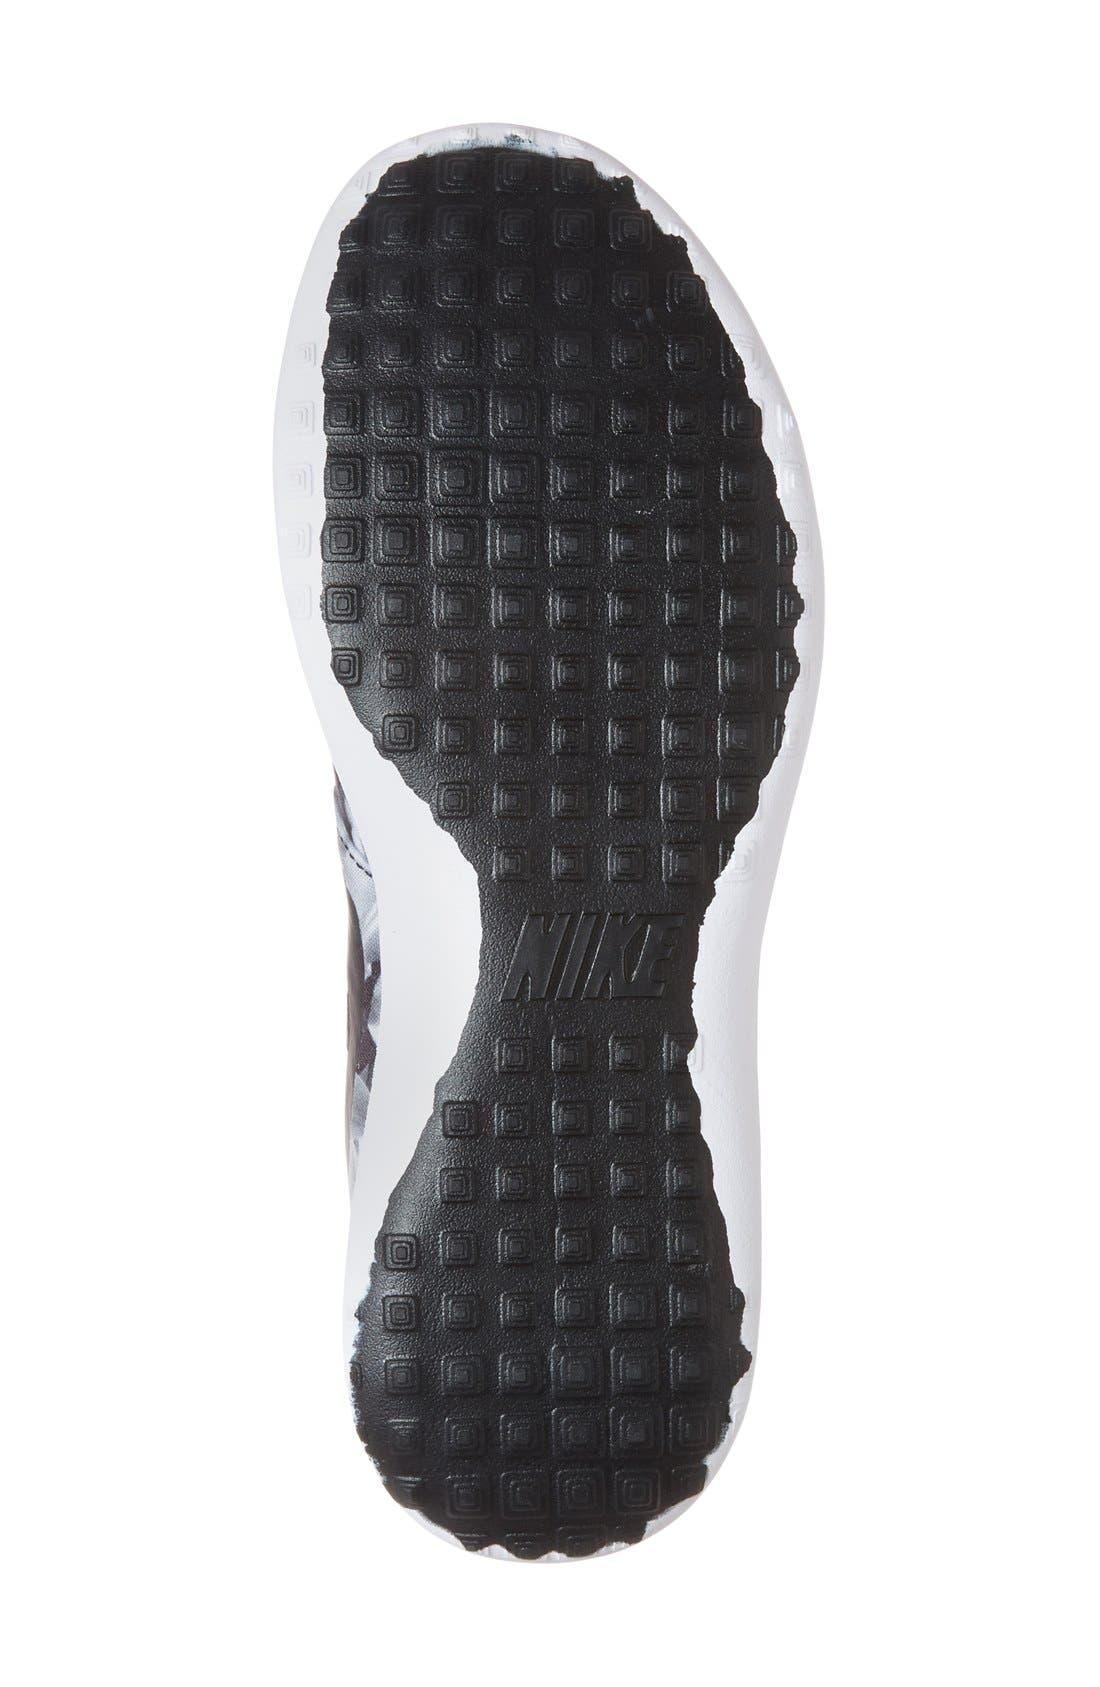 Juvenate Sneaker,                             Alternate thumbnail 6, color,                             Black/ Black/ White